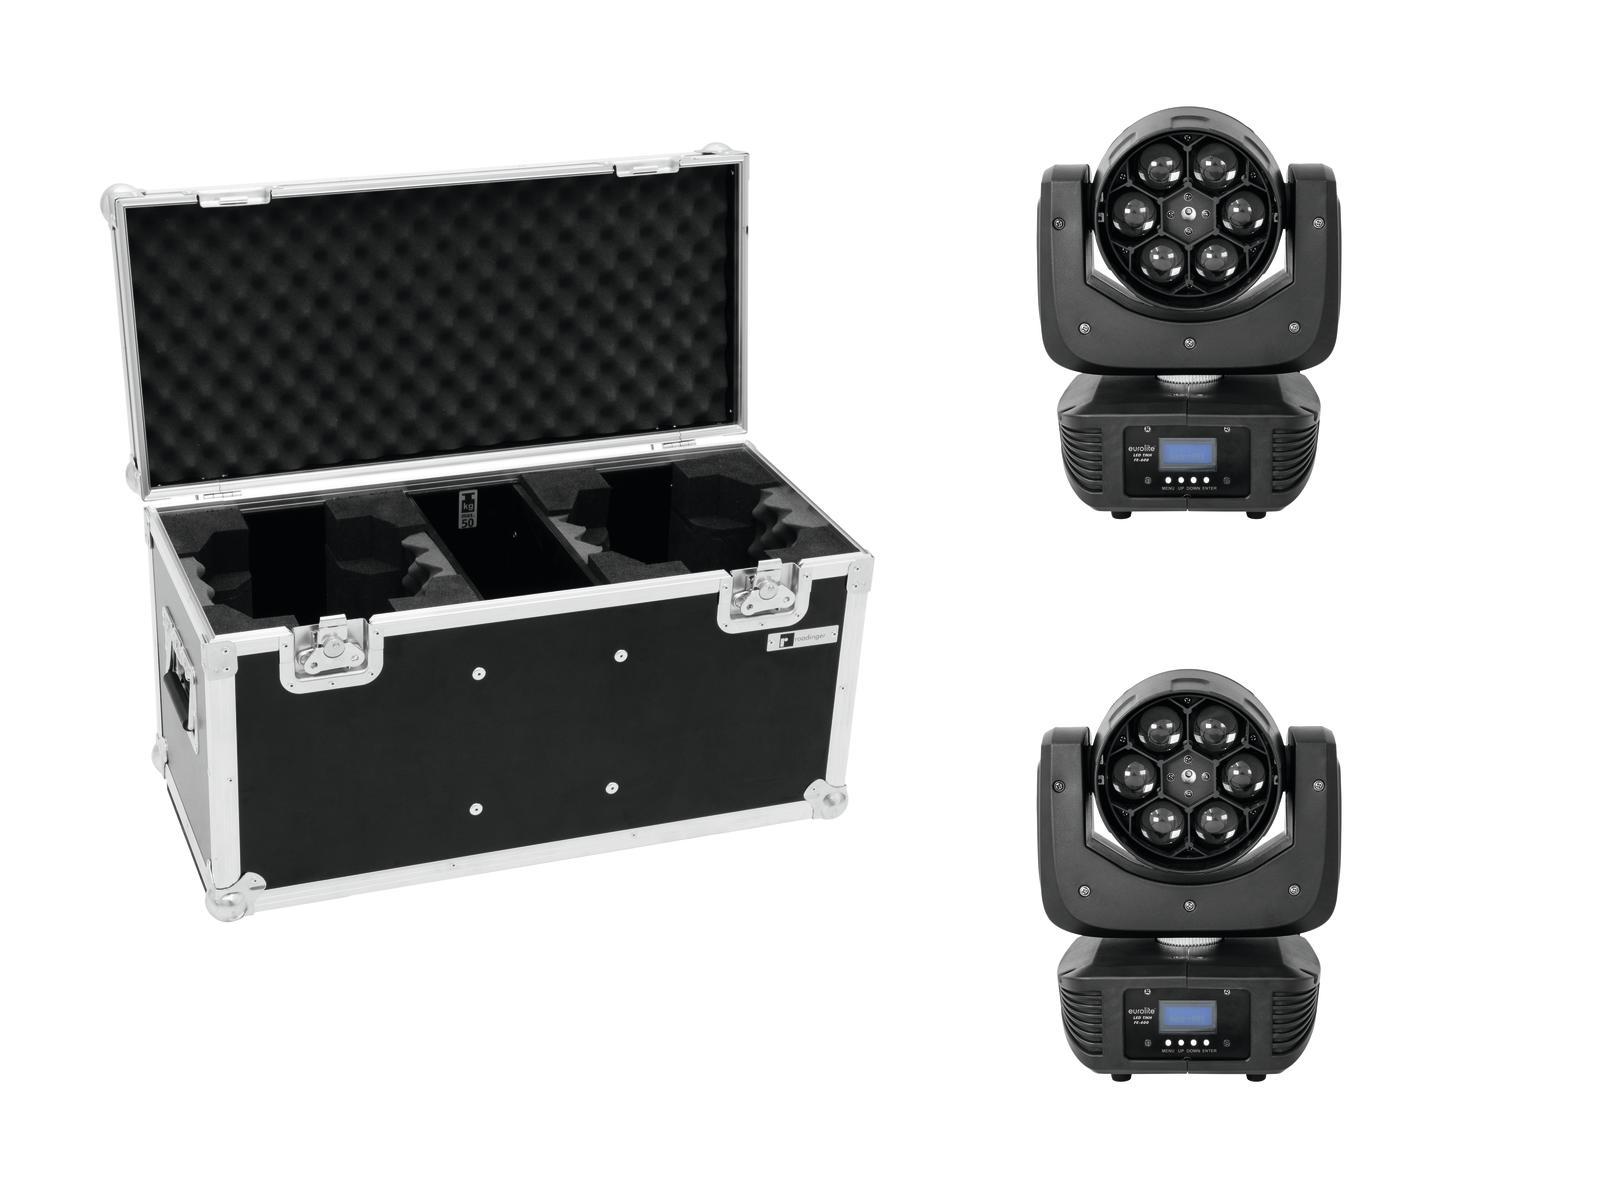 EUROLITE Set 2x LED TMH FE-300 Beam/Fiore effetto + Caso